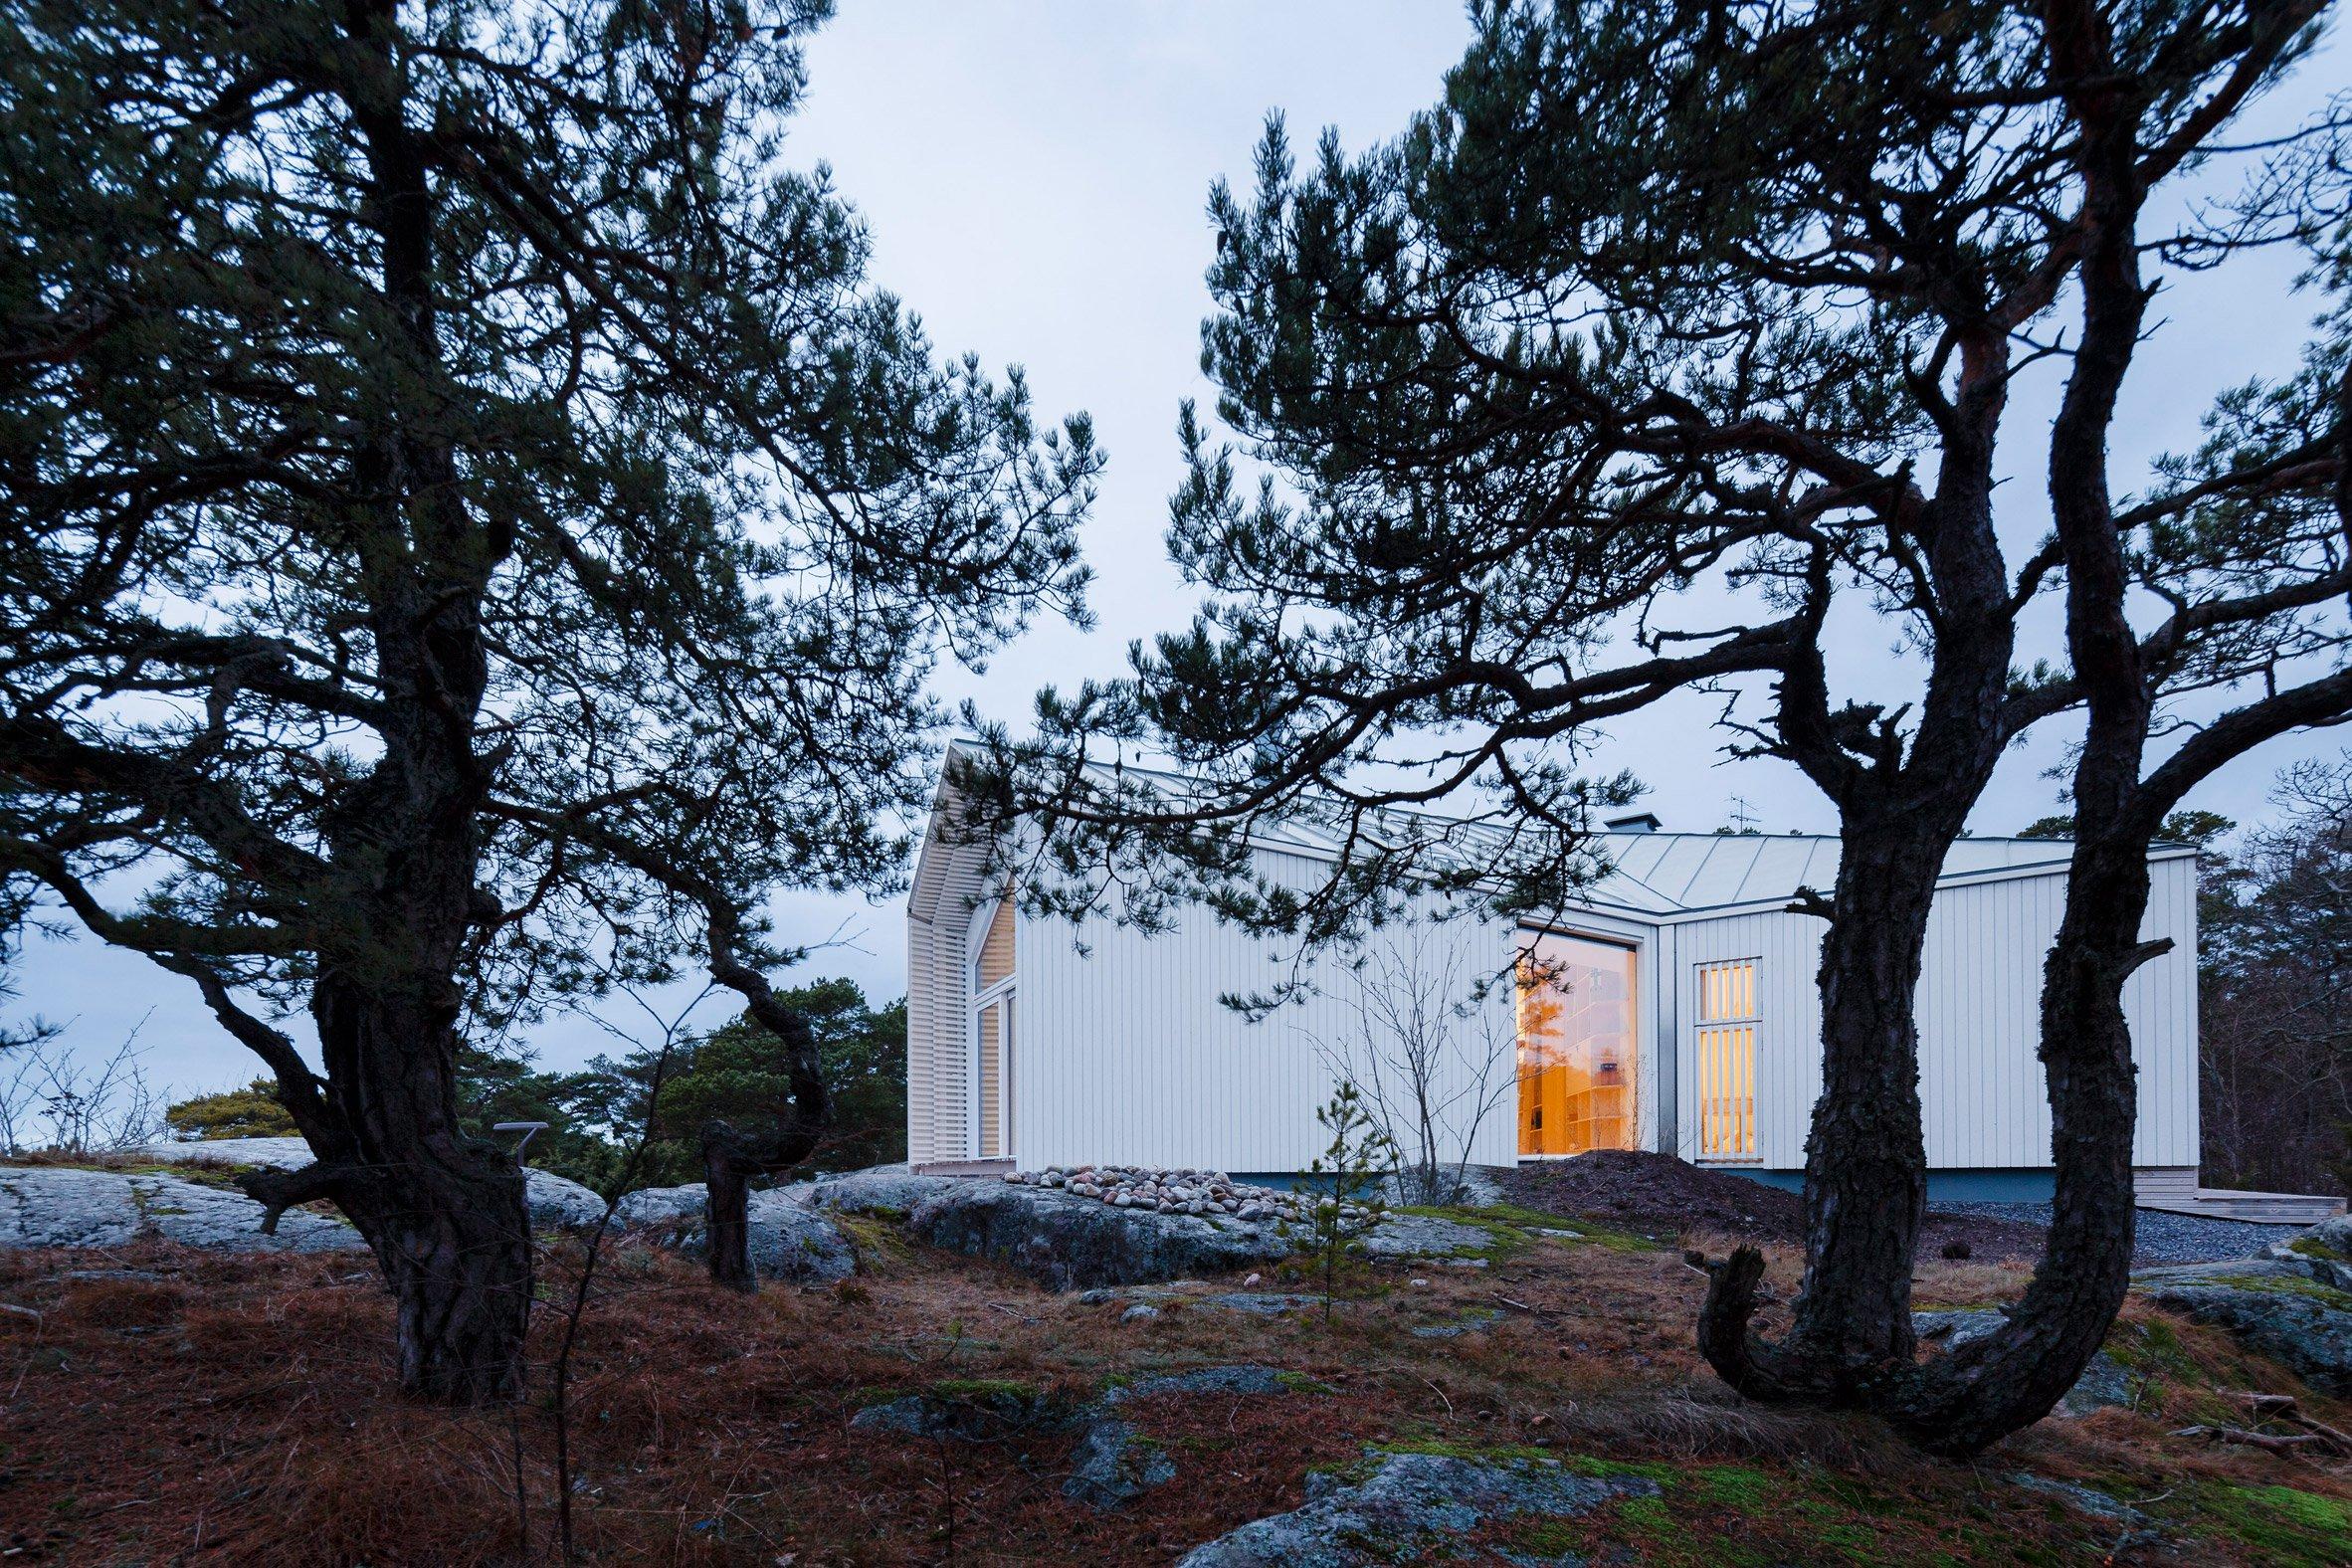 Mer Arkkitehdit sets spruce-panelled villa into cliff face in Finnish seaside town